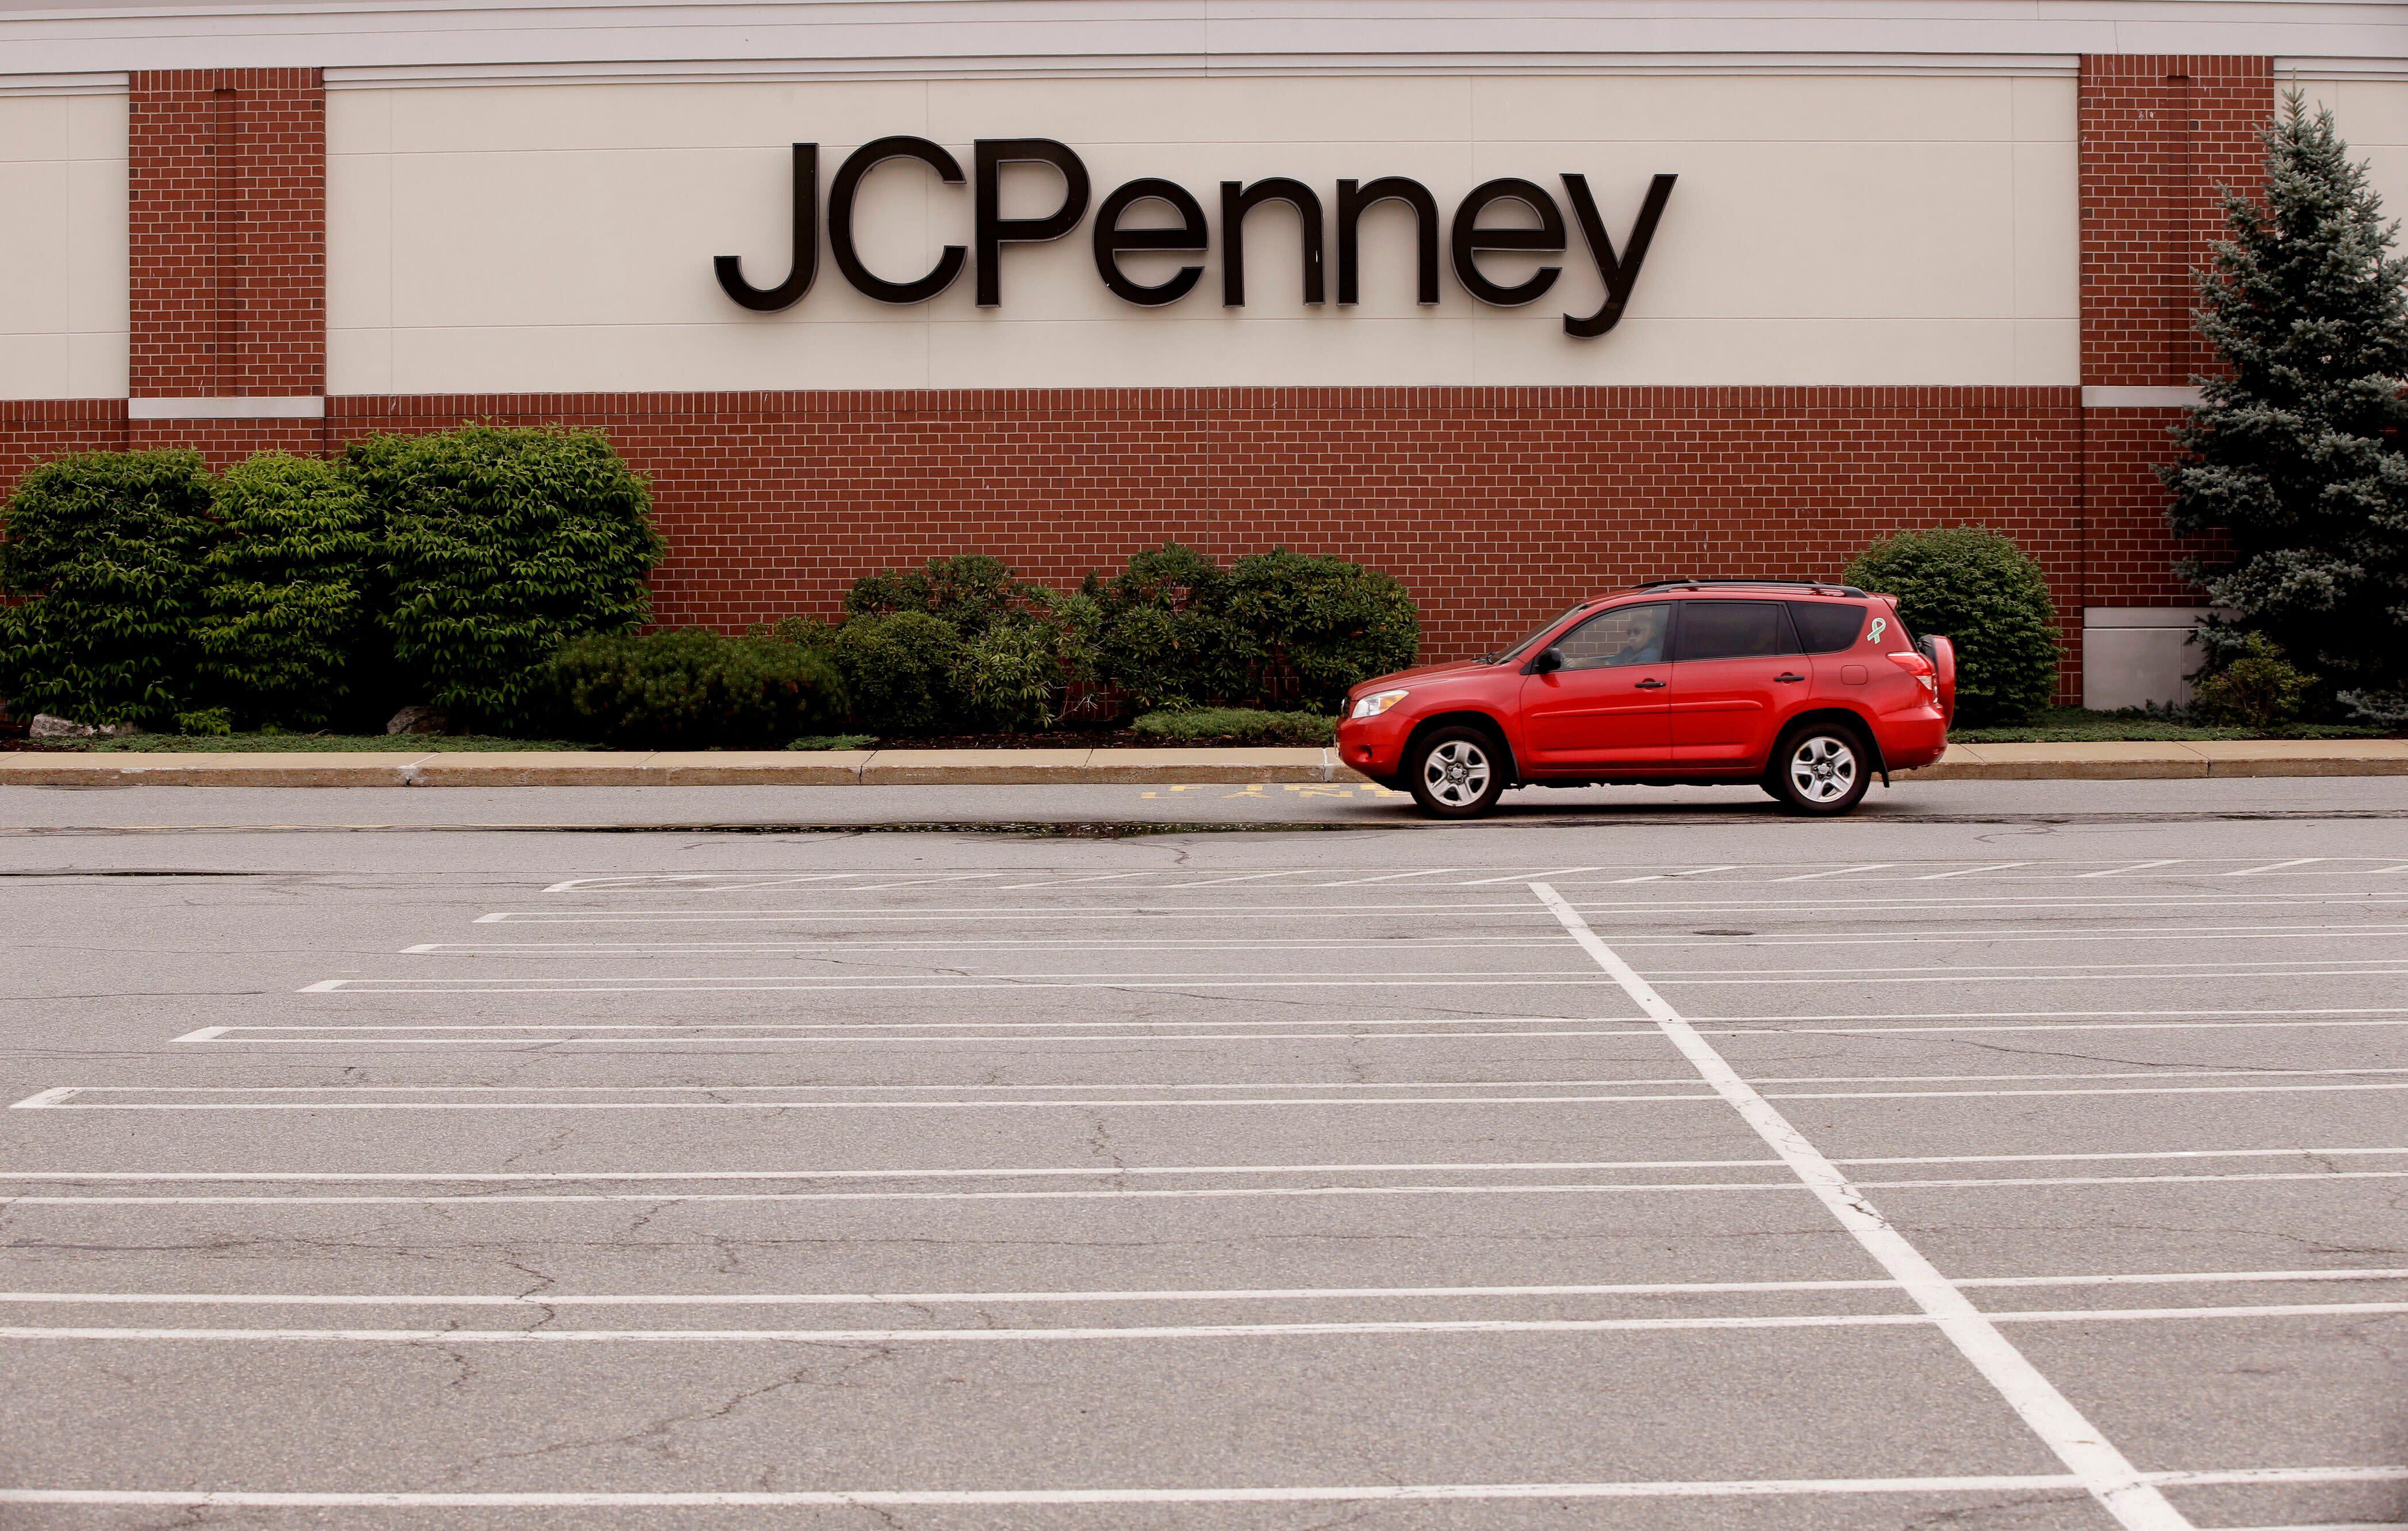 J.C. Penney's stock just fell below $1